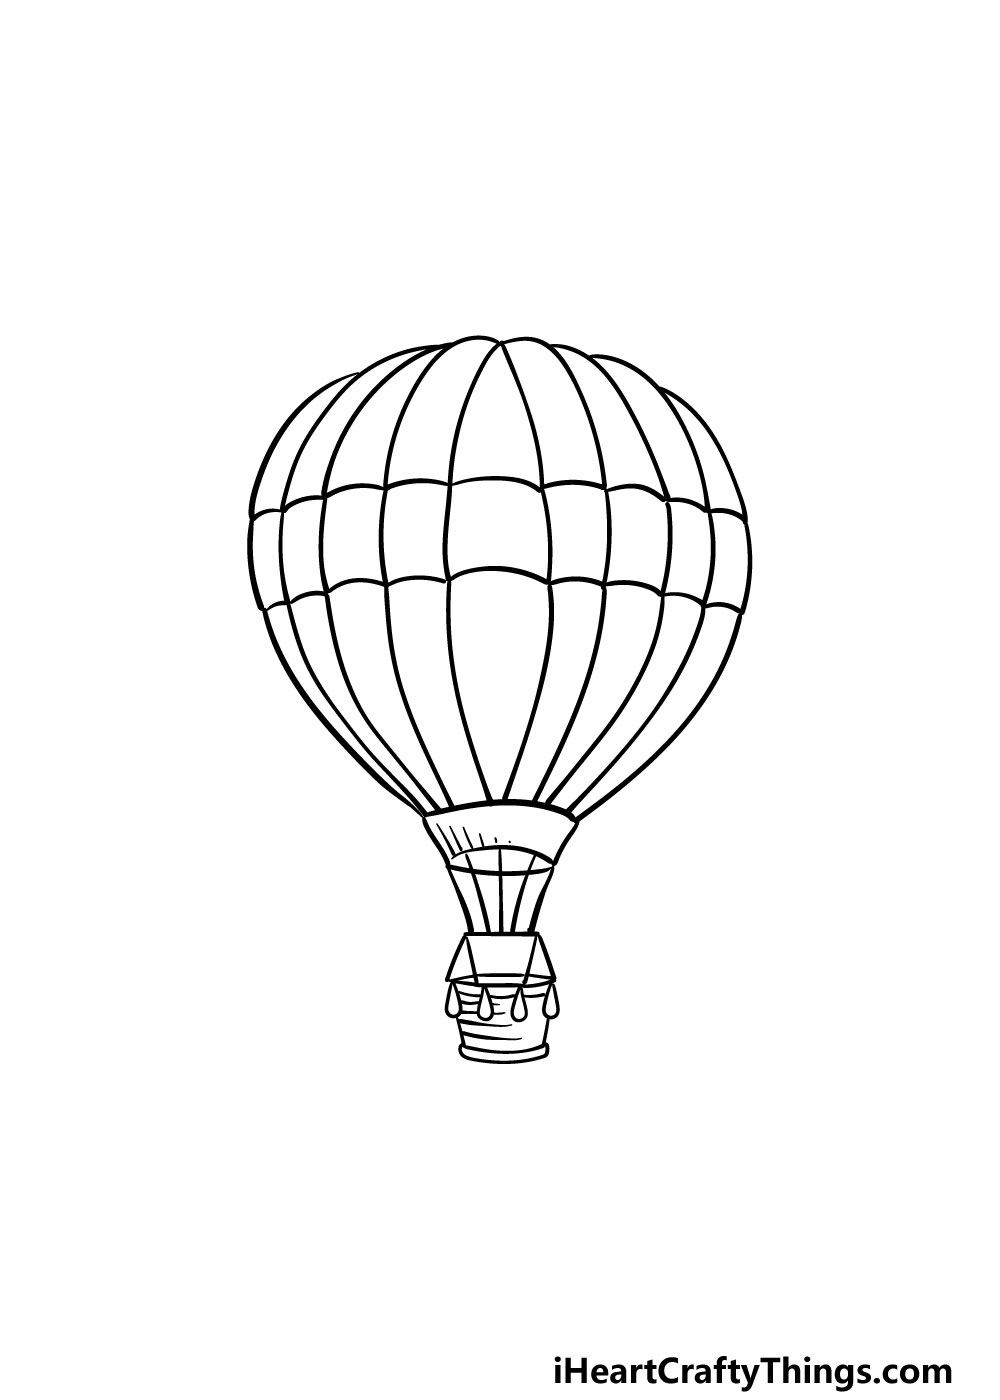 drawing a hot air balloon step 7